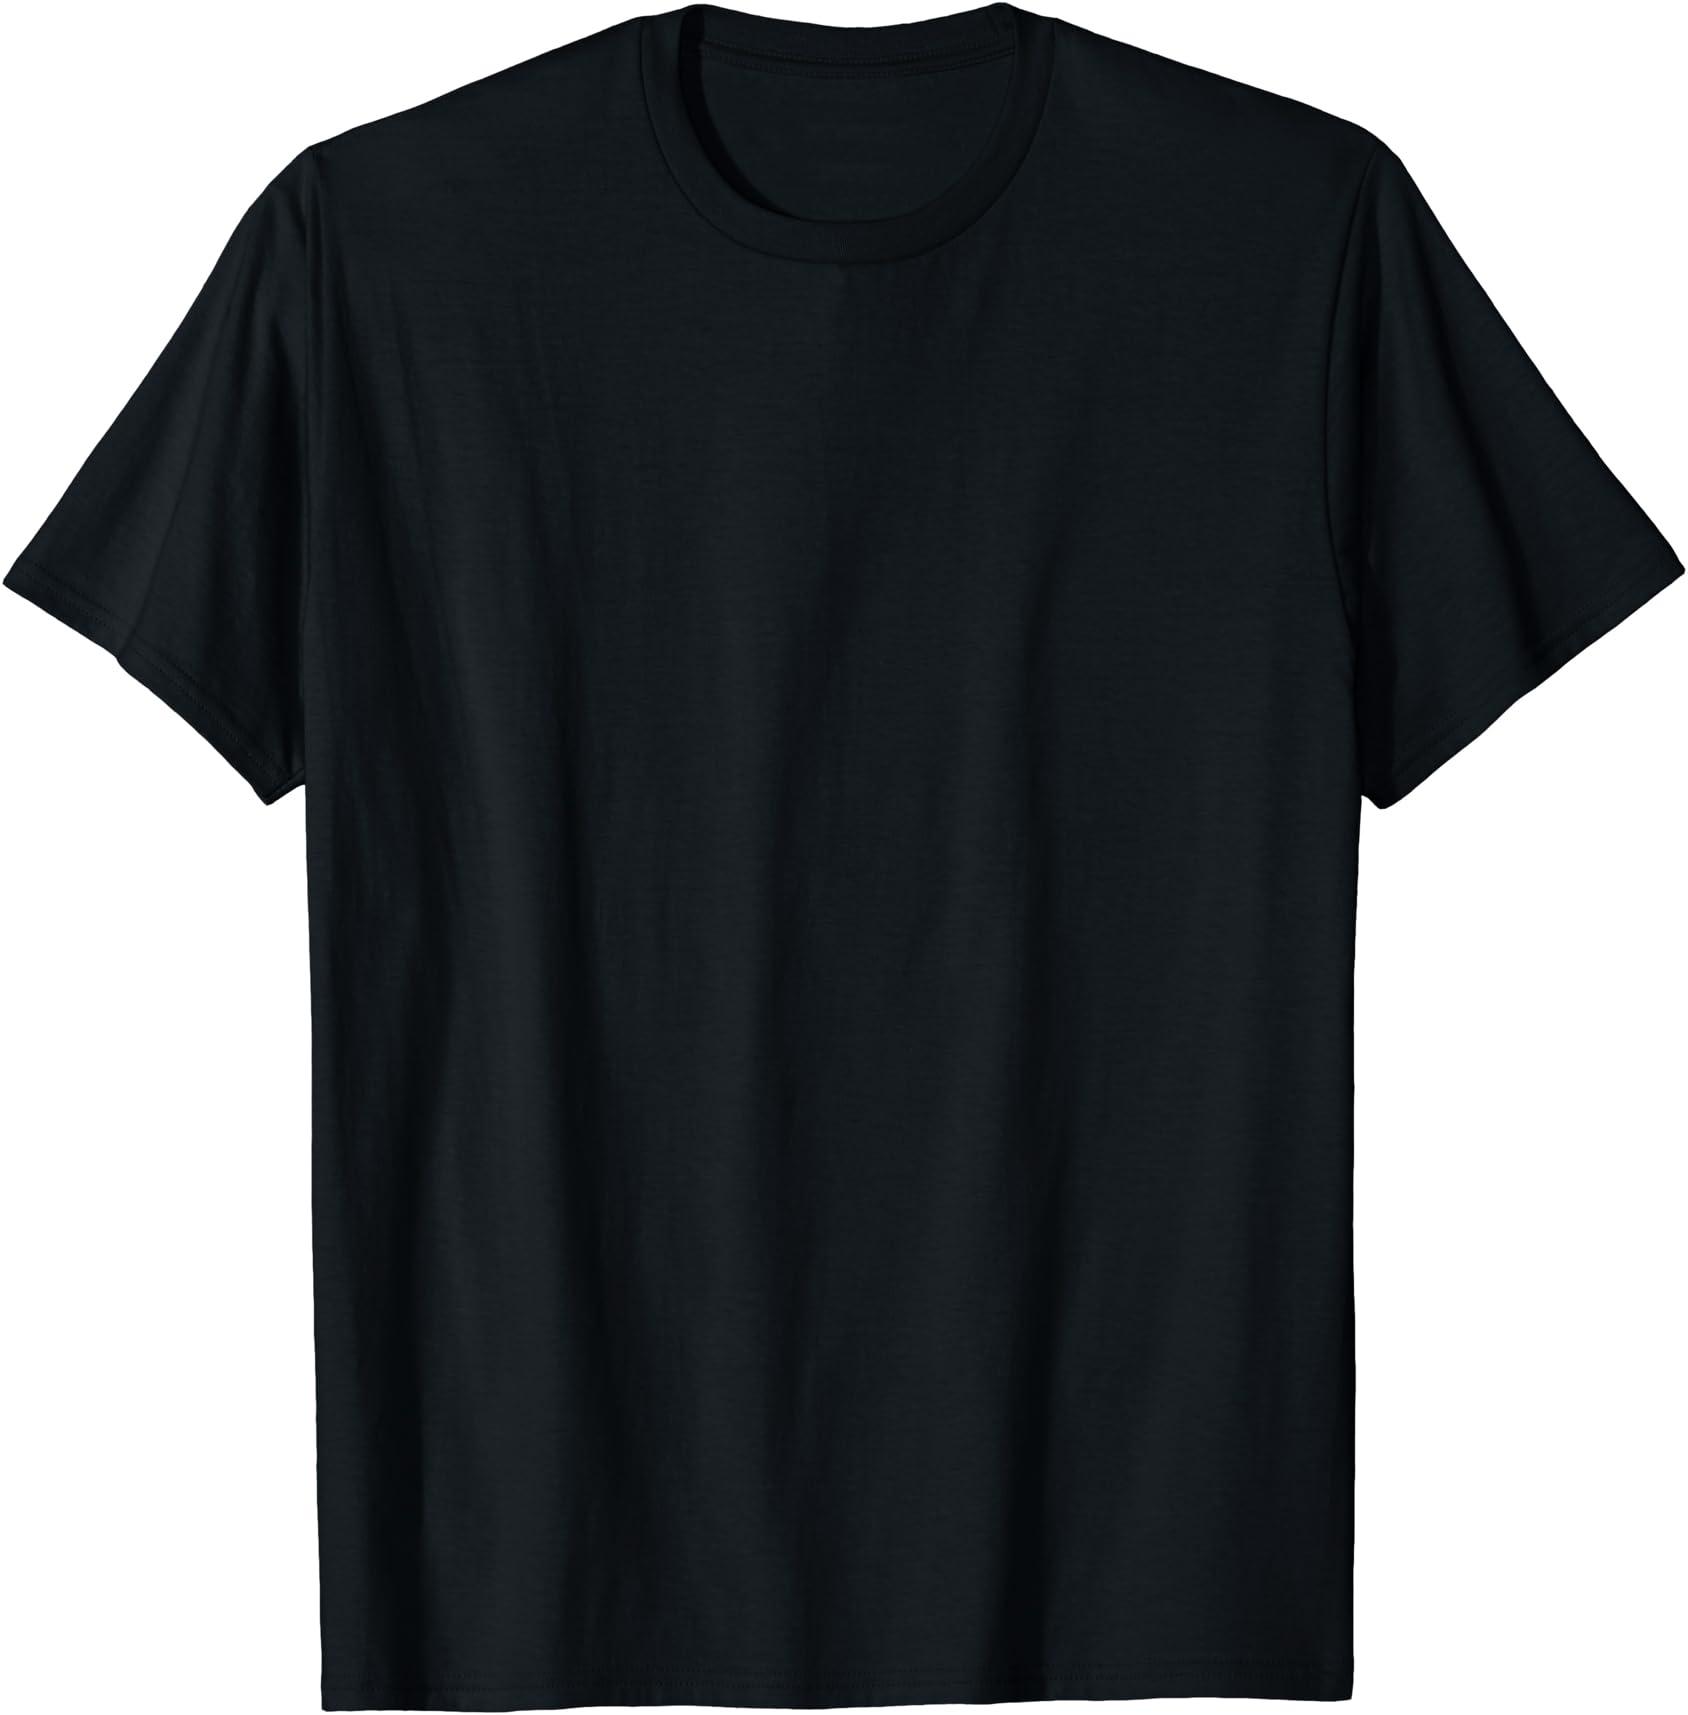 Funny Novelty T-Shirt Mens tee TShirt Flaming Heart